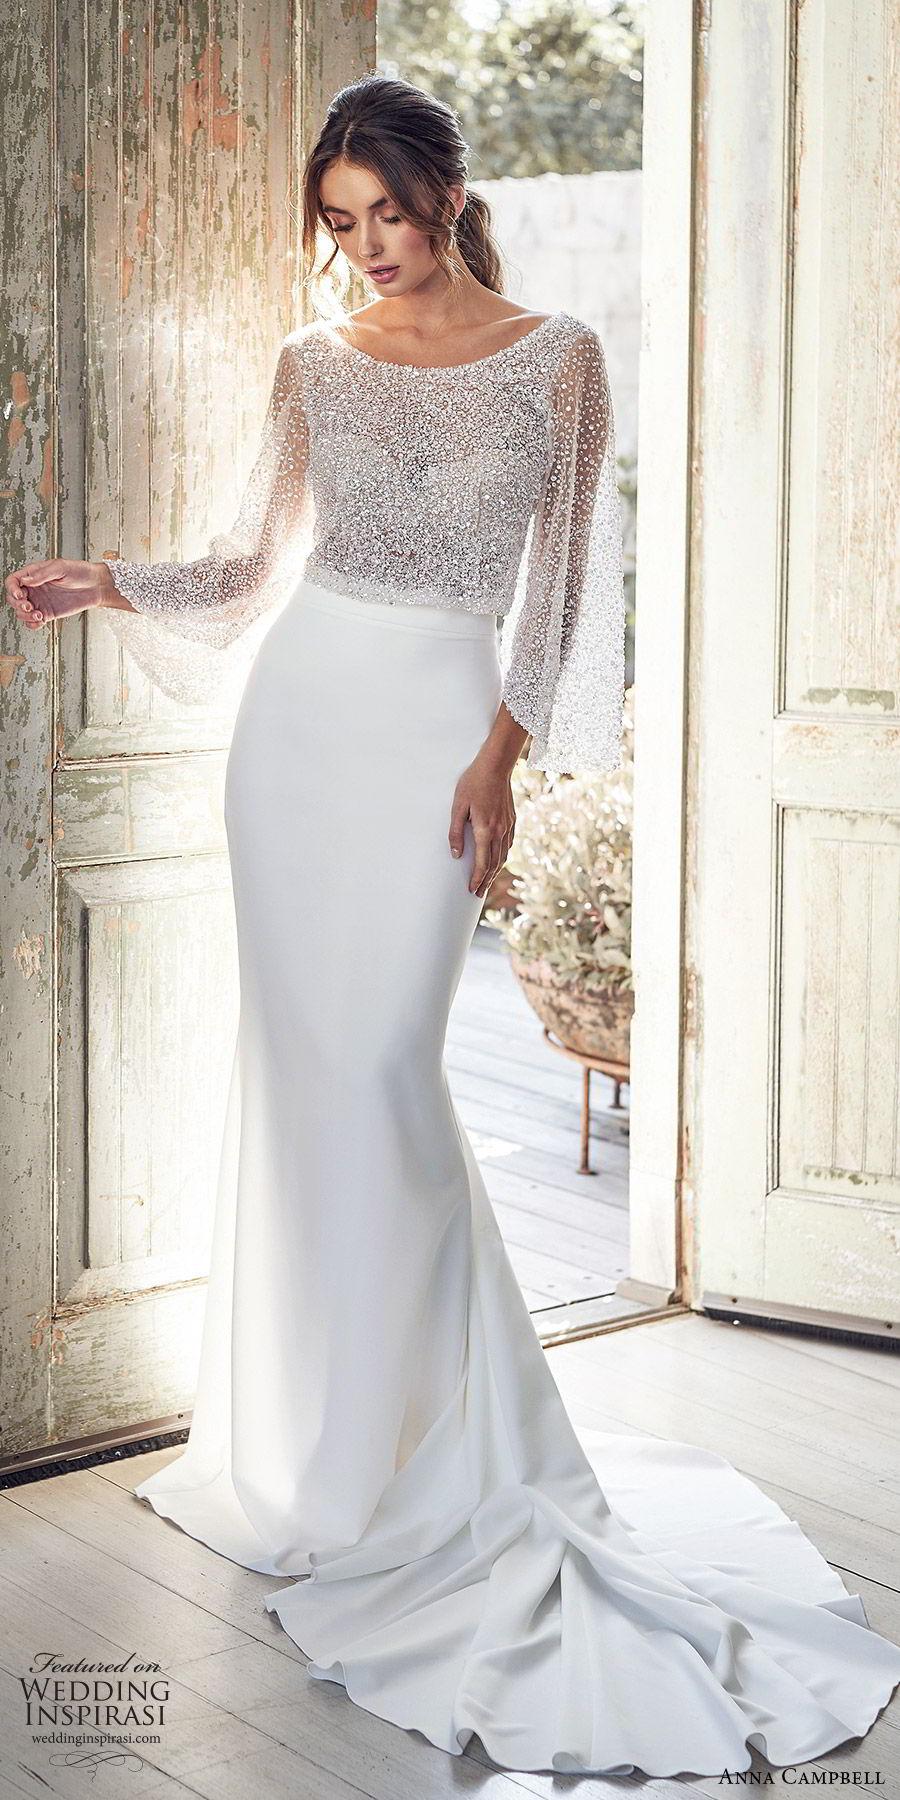 anna campbell 2020 bridal long flare sleeves bateau neckline heavily embellished bodice top sheath skirt wedding dress (5) glitzy glam elegant v back  chapel train mv